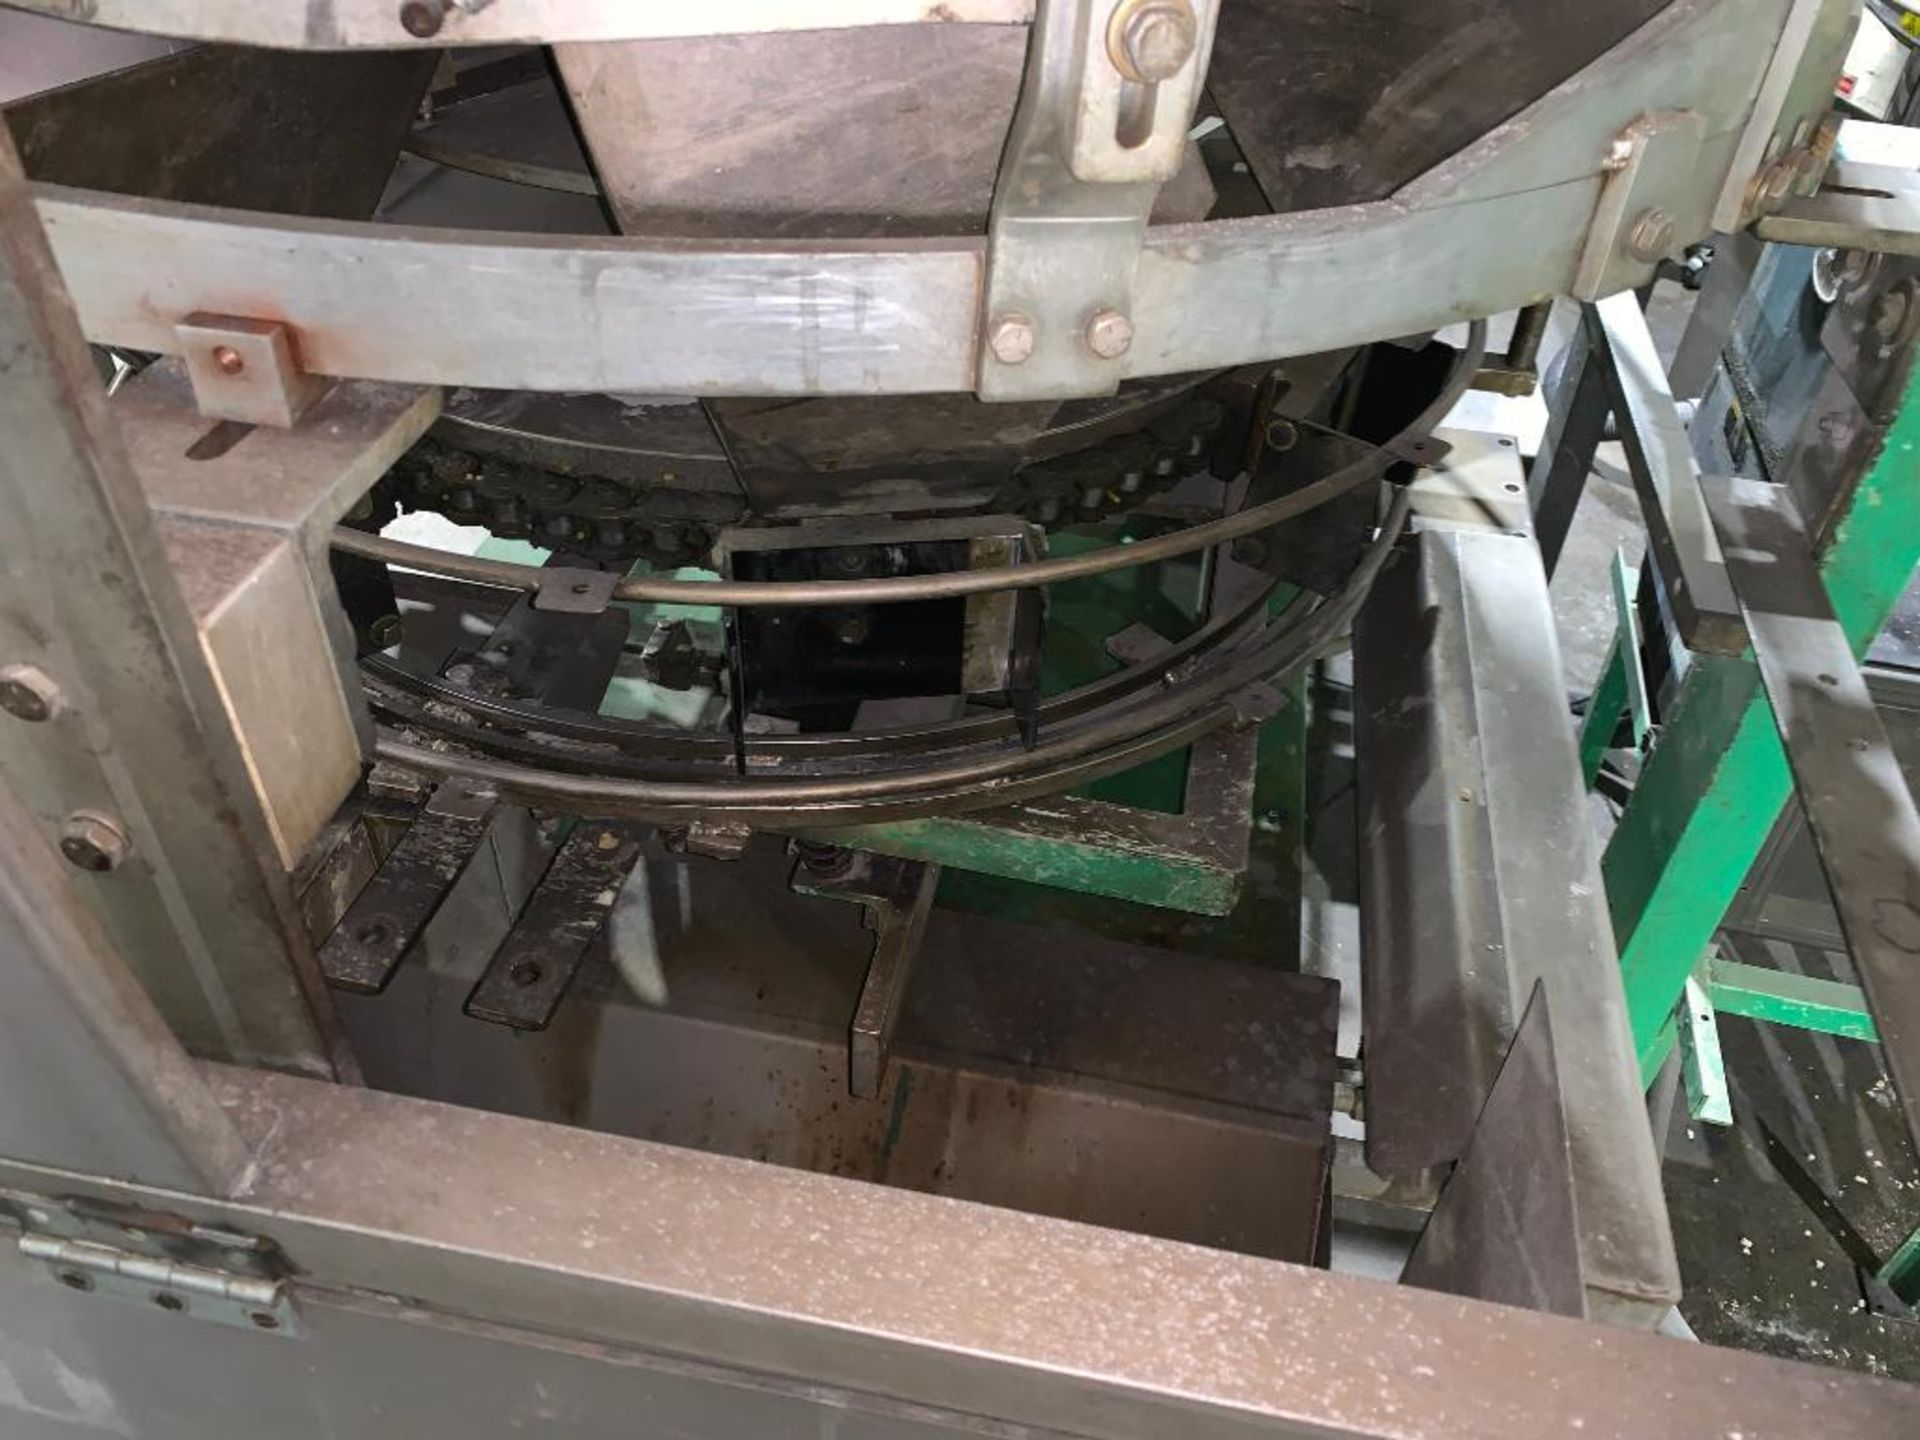 1978 Clybourn carton erecting filling closing machine - Image 31 of 68